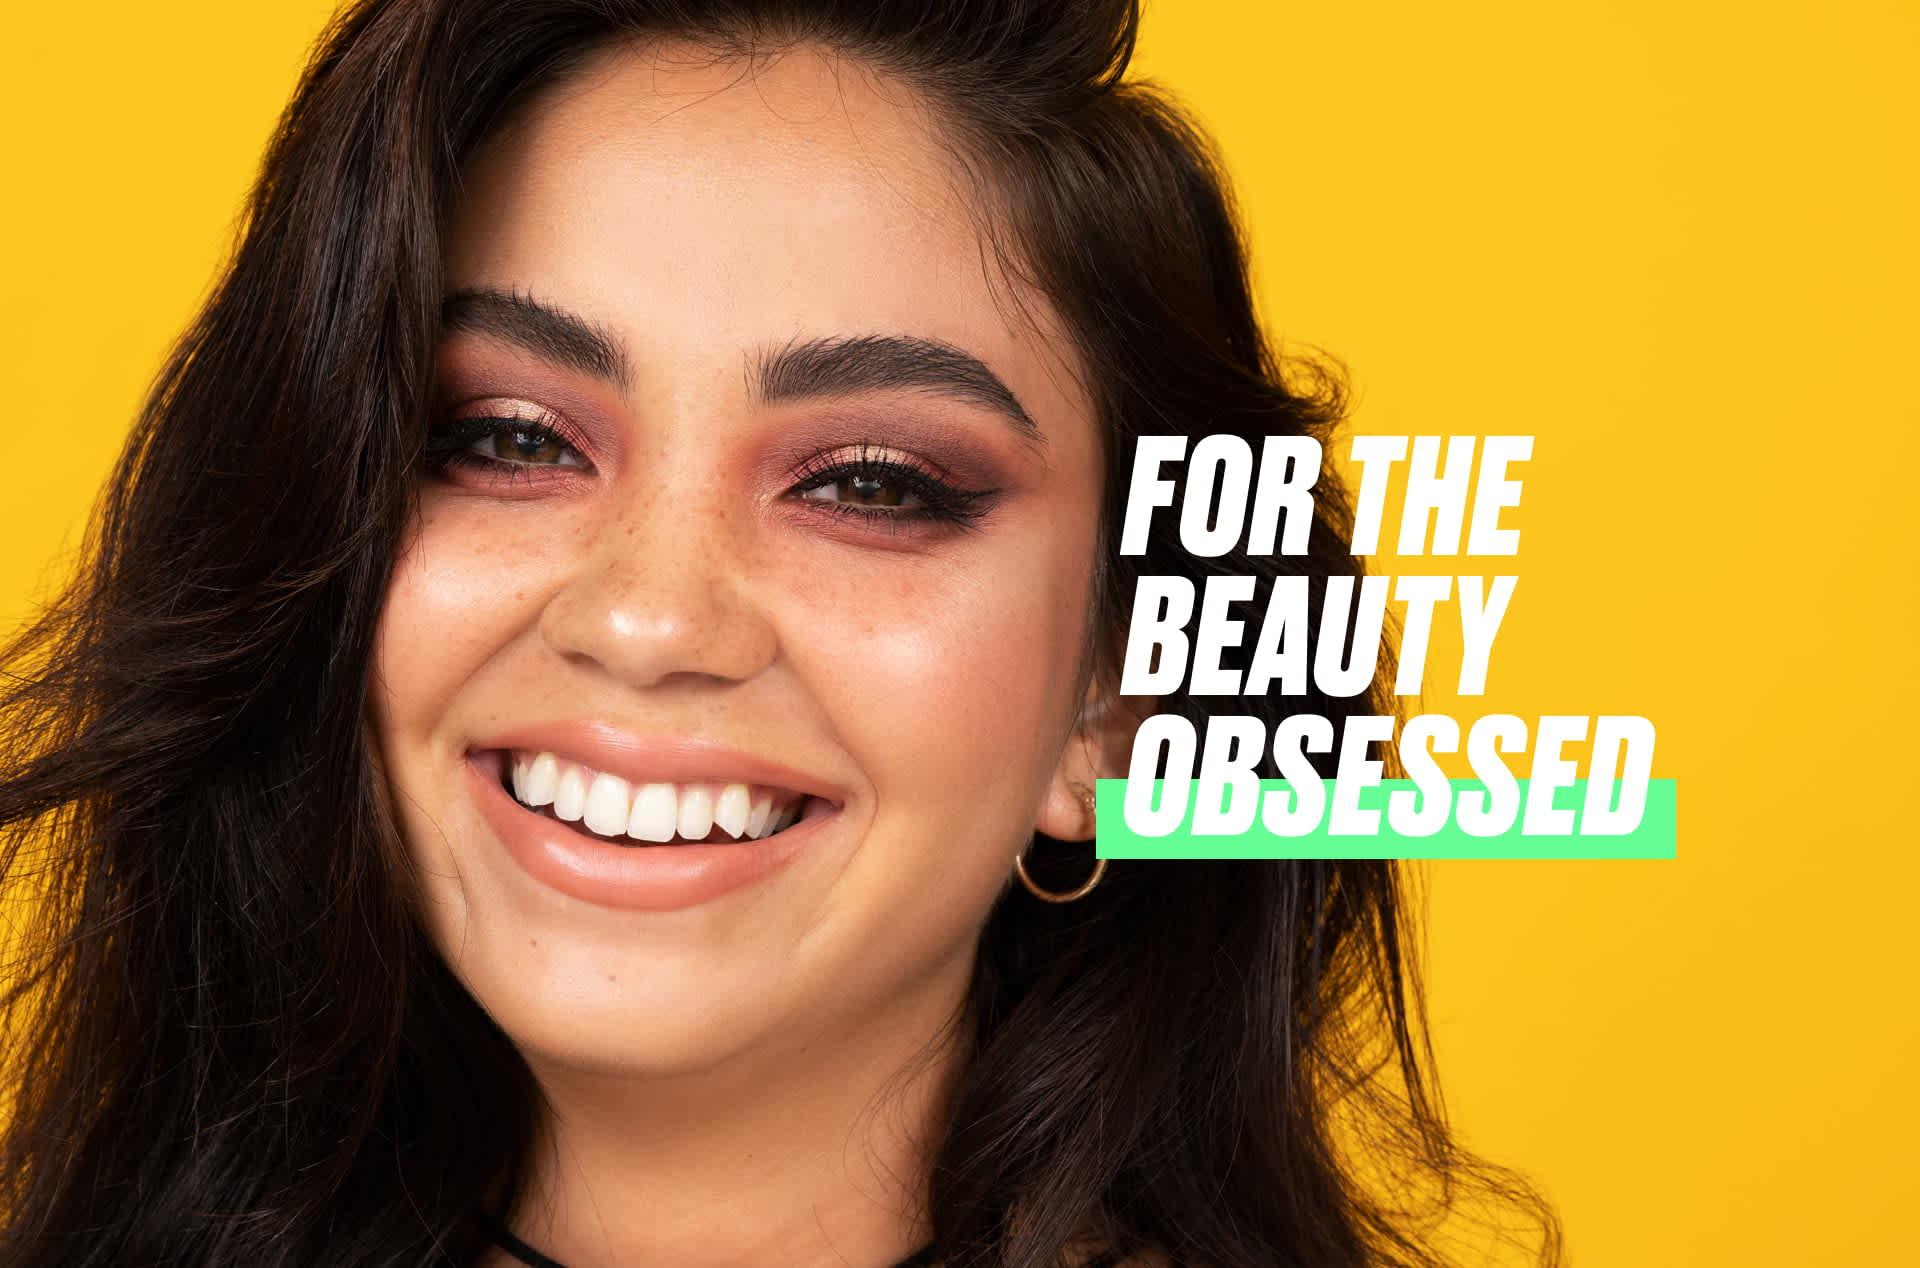 Makeup | Hair Care | Skin Care | Nails | Beauty Bay